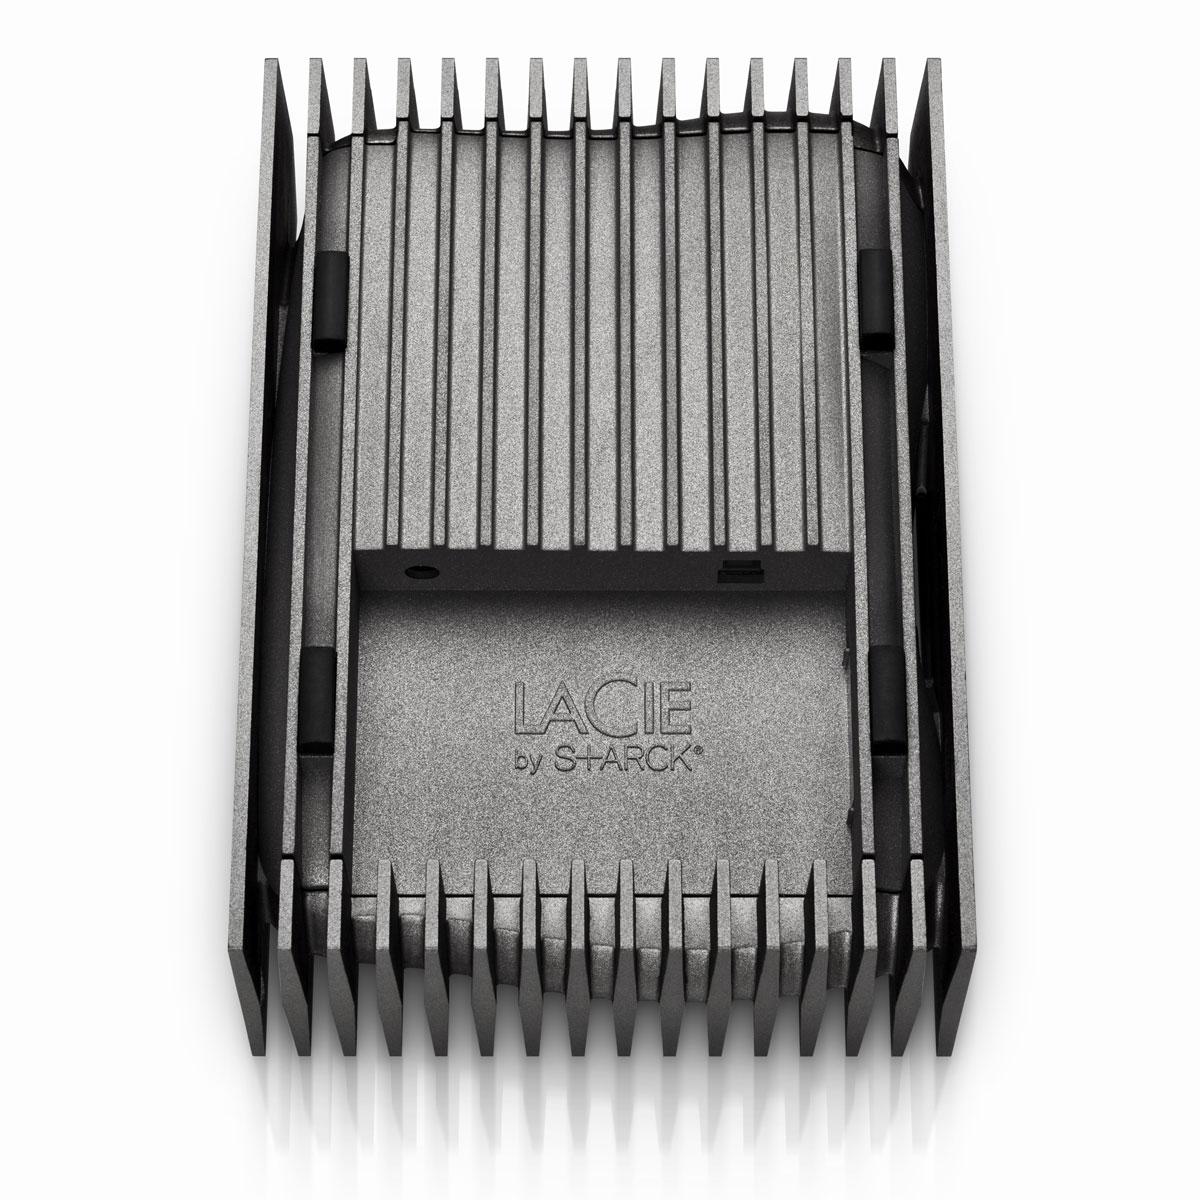 Lacie 9000119 Blade Runner 4TB USB 3 0 External Hard Drive 4 TB